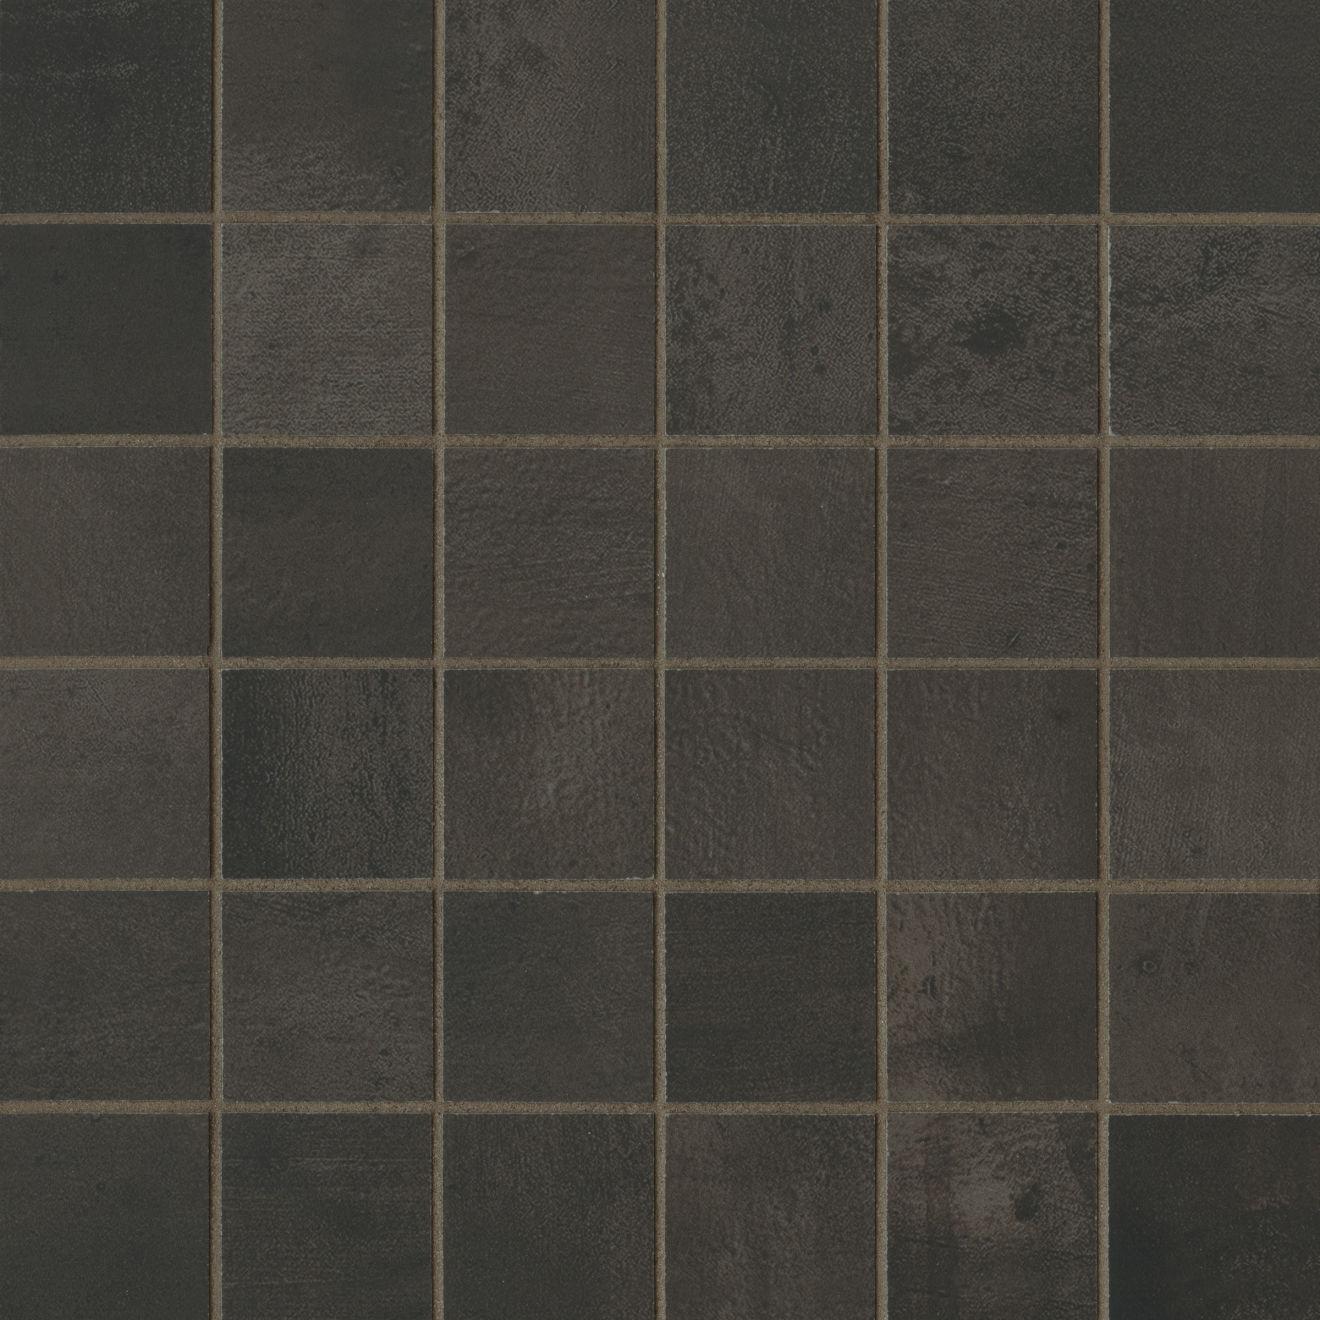 "Chateau 2"" x 2"" Floor & Wall Mosaic in Tobacco"